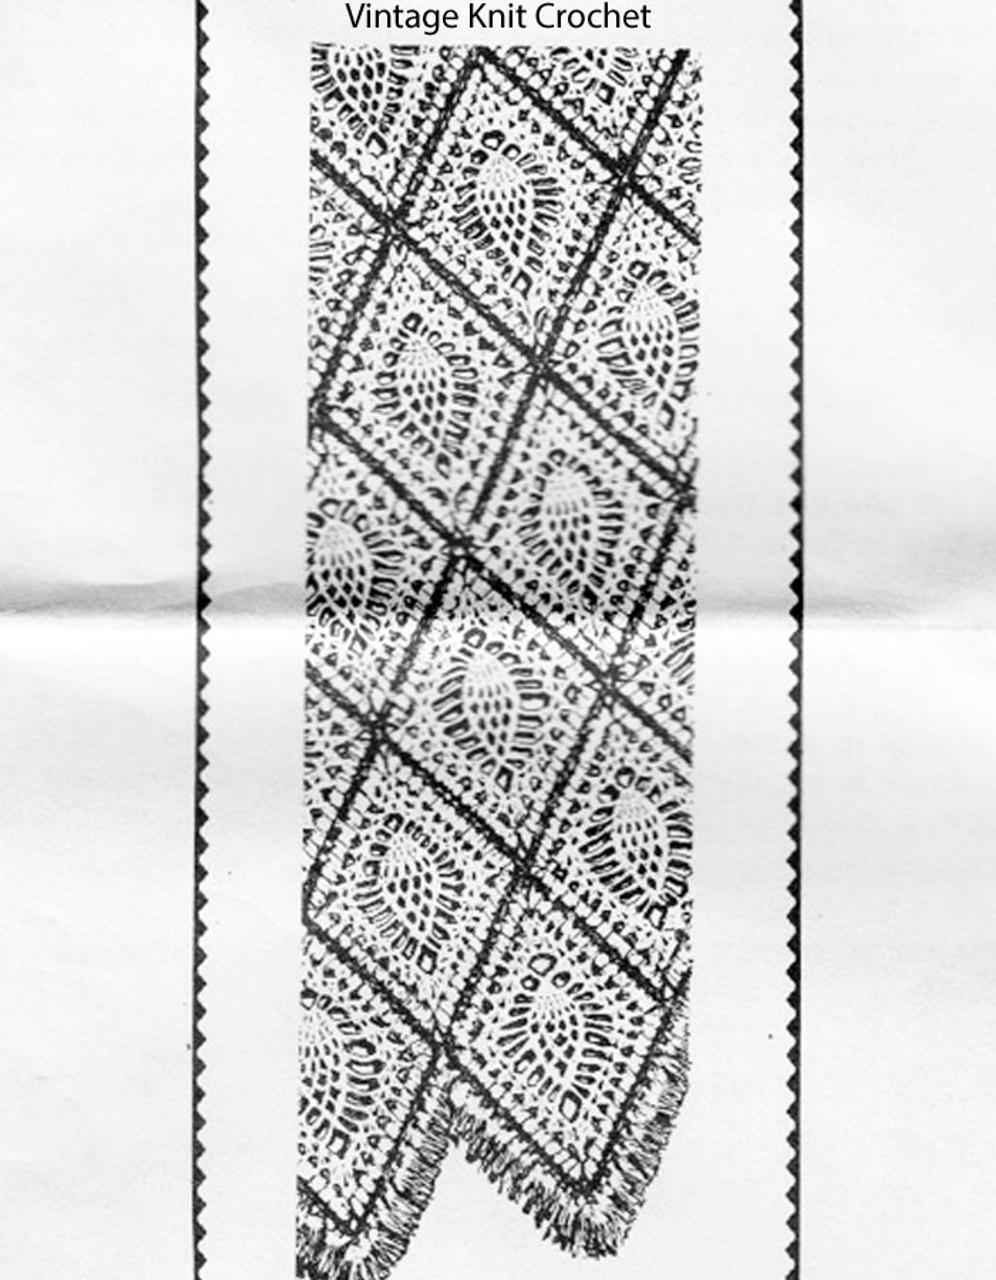 Pineapple diamond crochet afghan pattern, Alice Brooks 7160